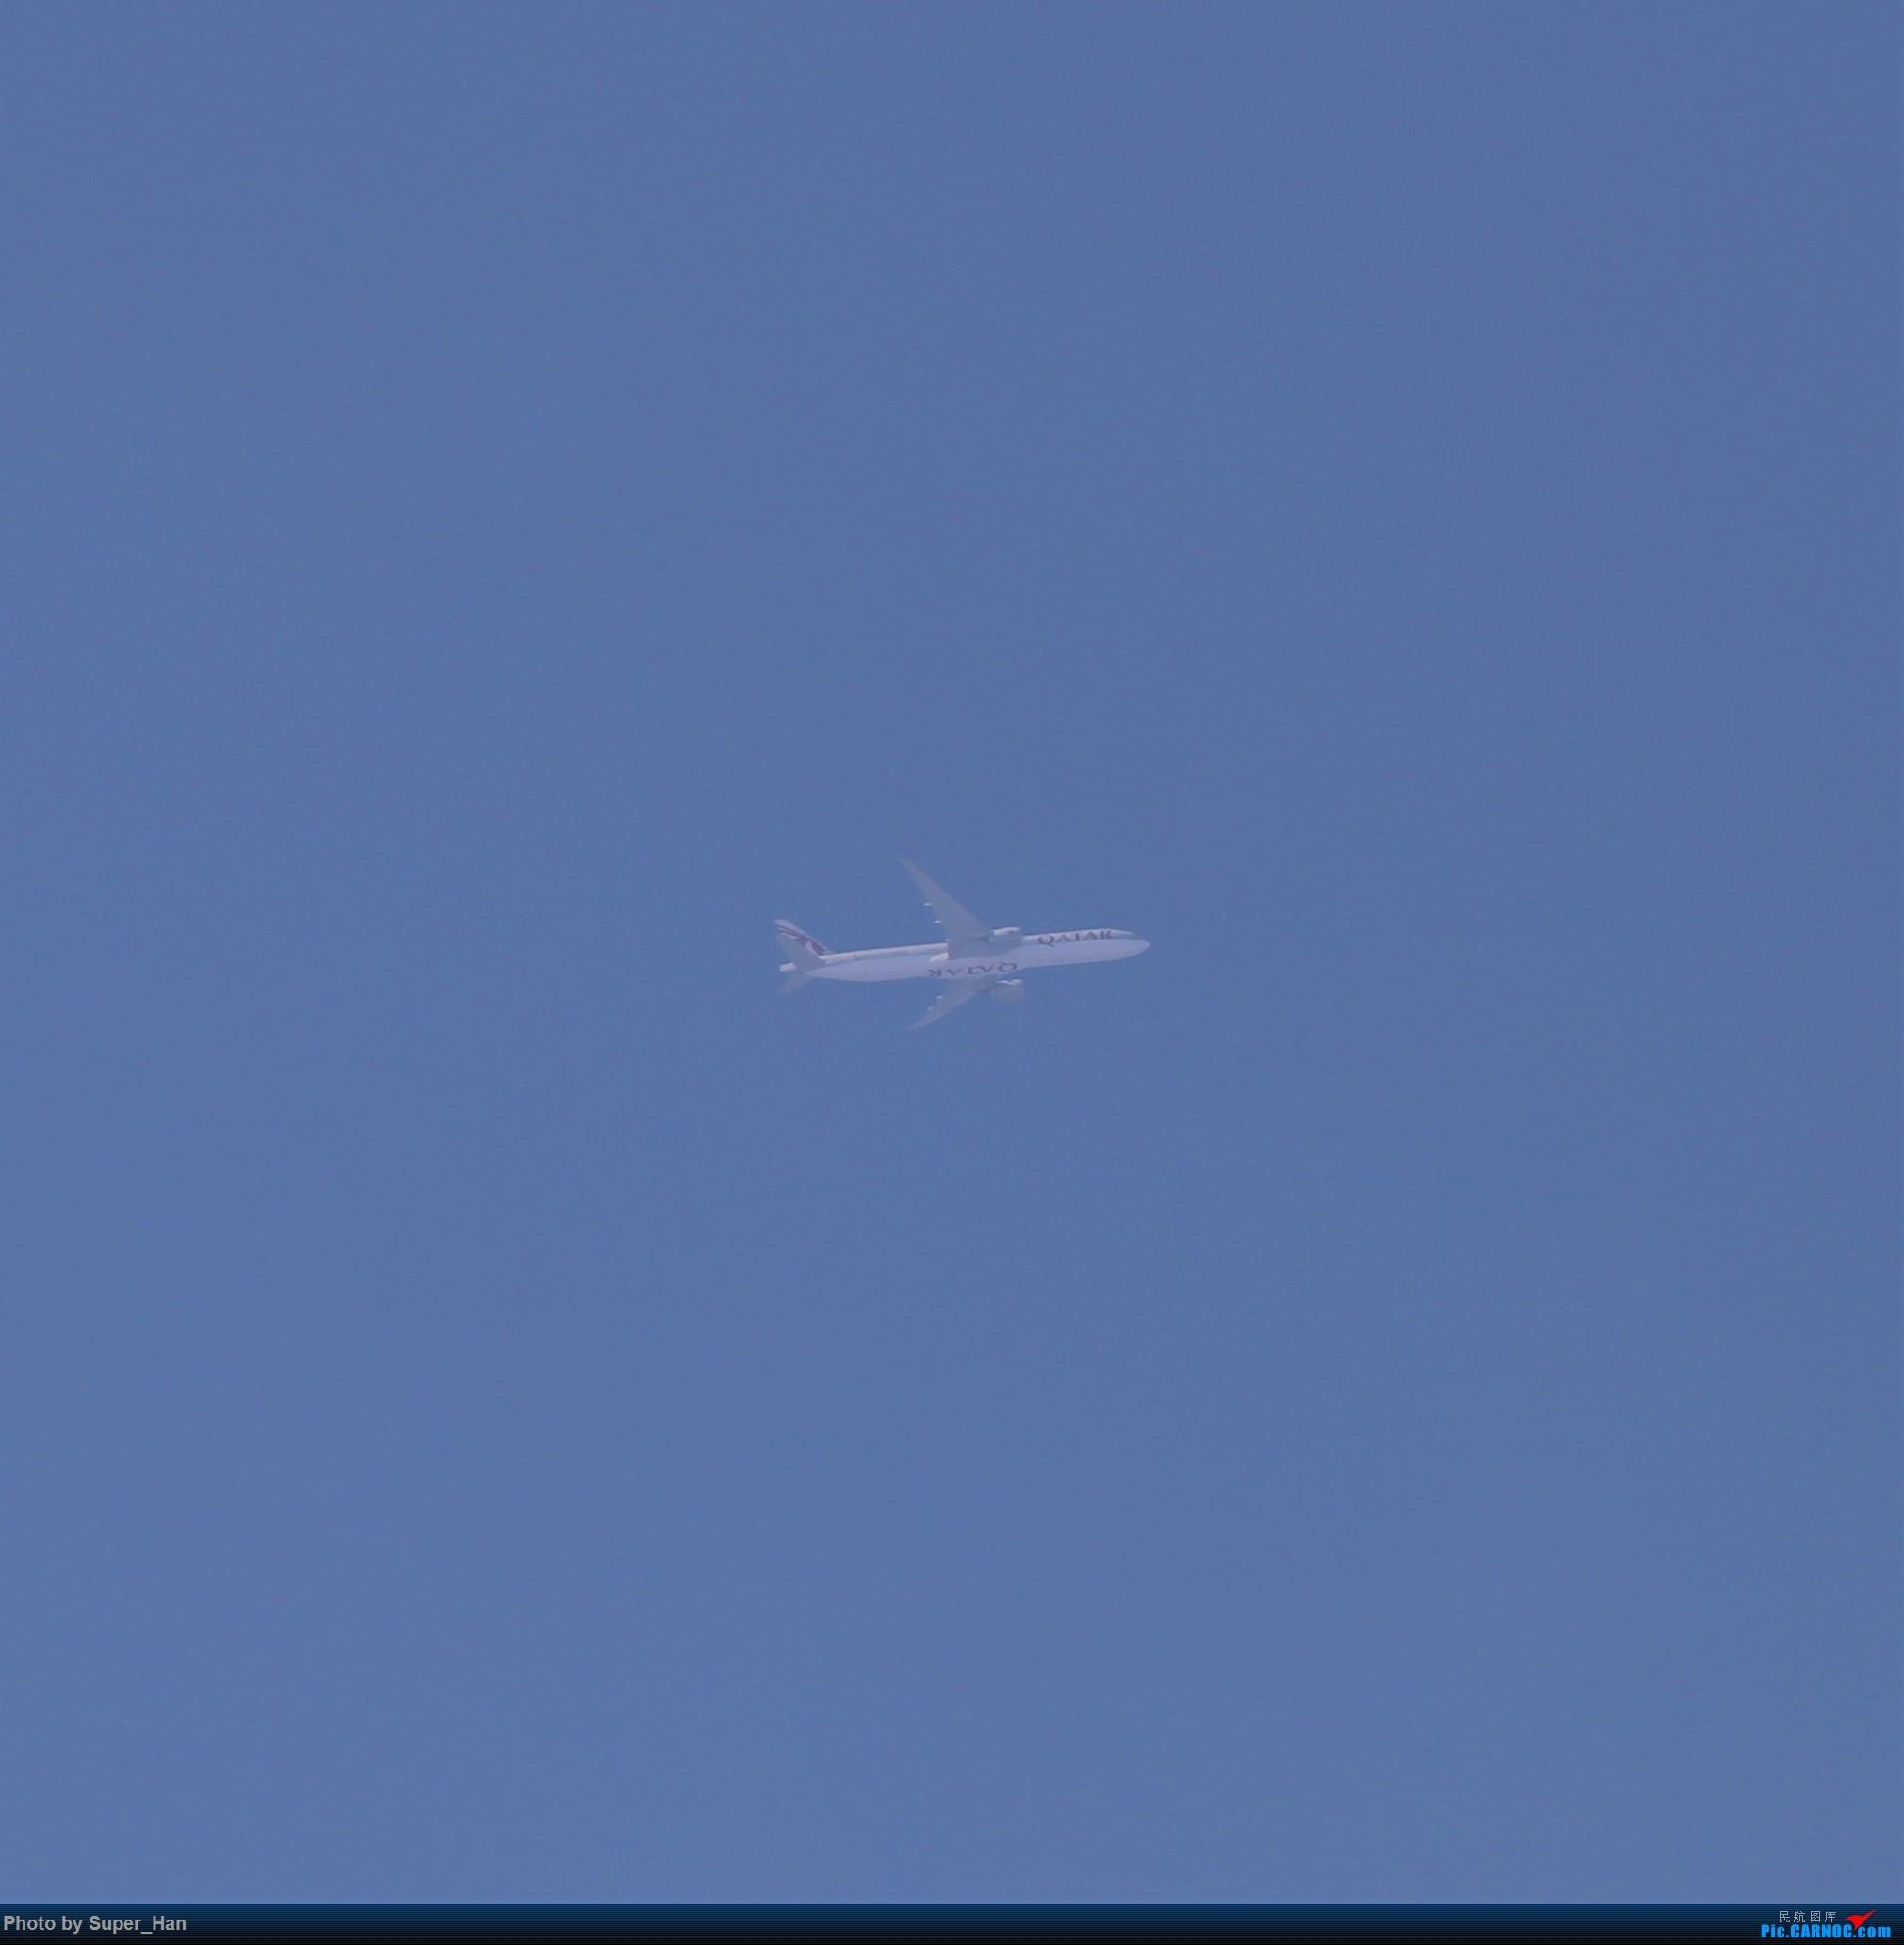 Re:[原创]【杭州飞友会】0715虹桥头顶降PVG的重型机 BOEING 777-300ER A7-BEJ 中国上海虹桥国际机场